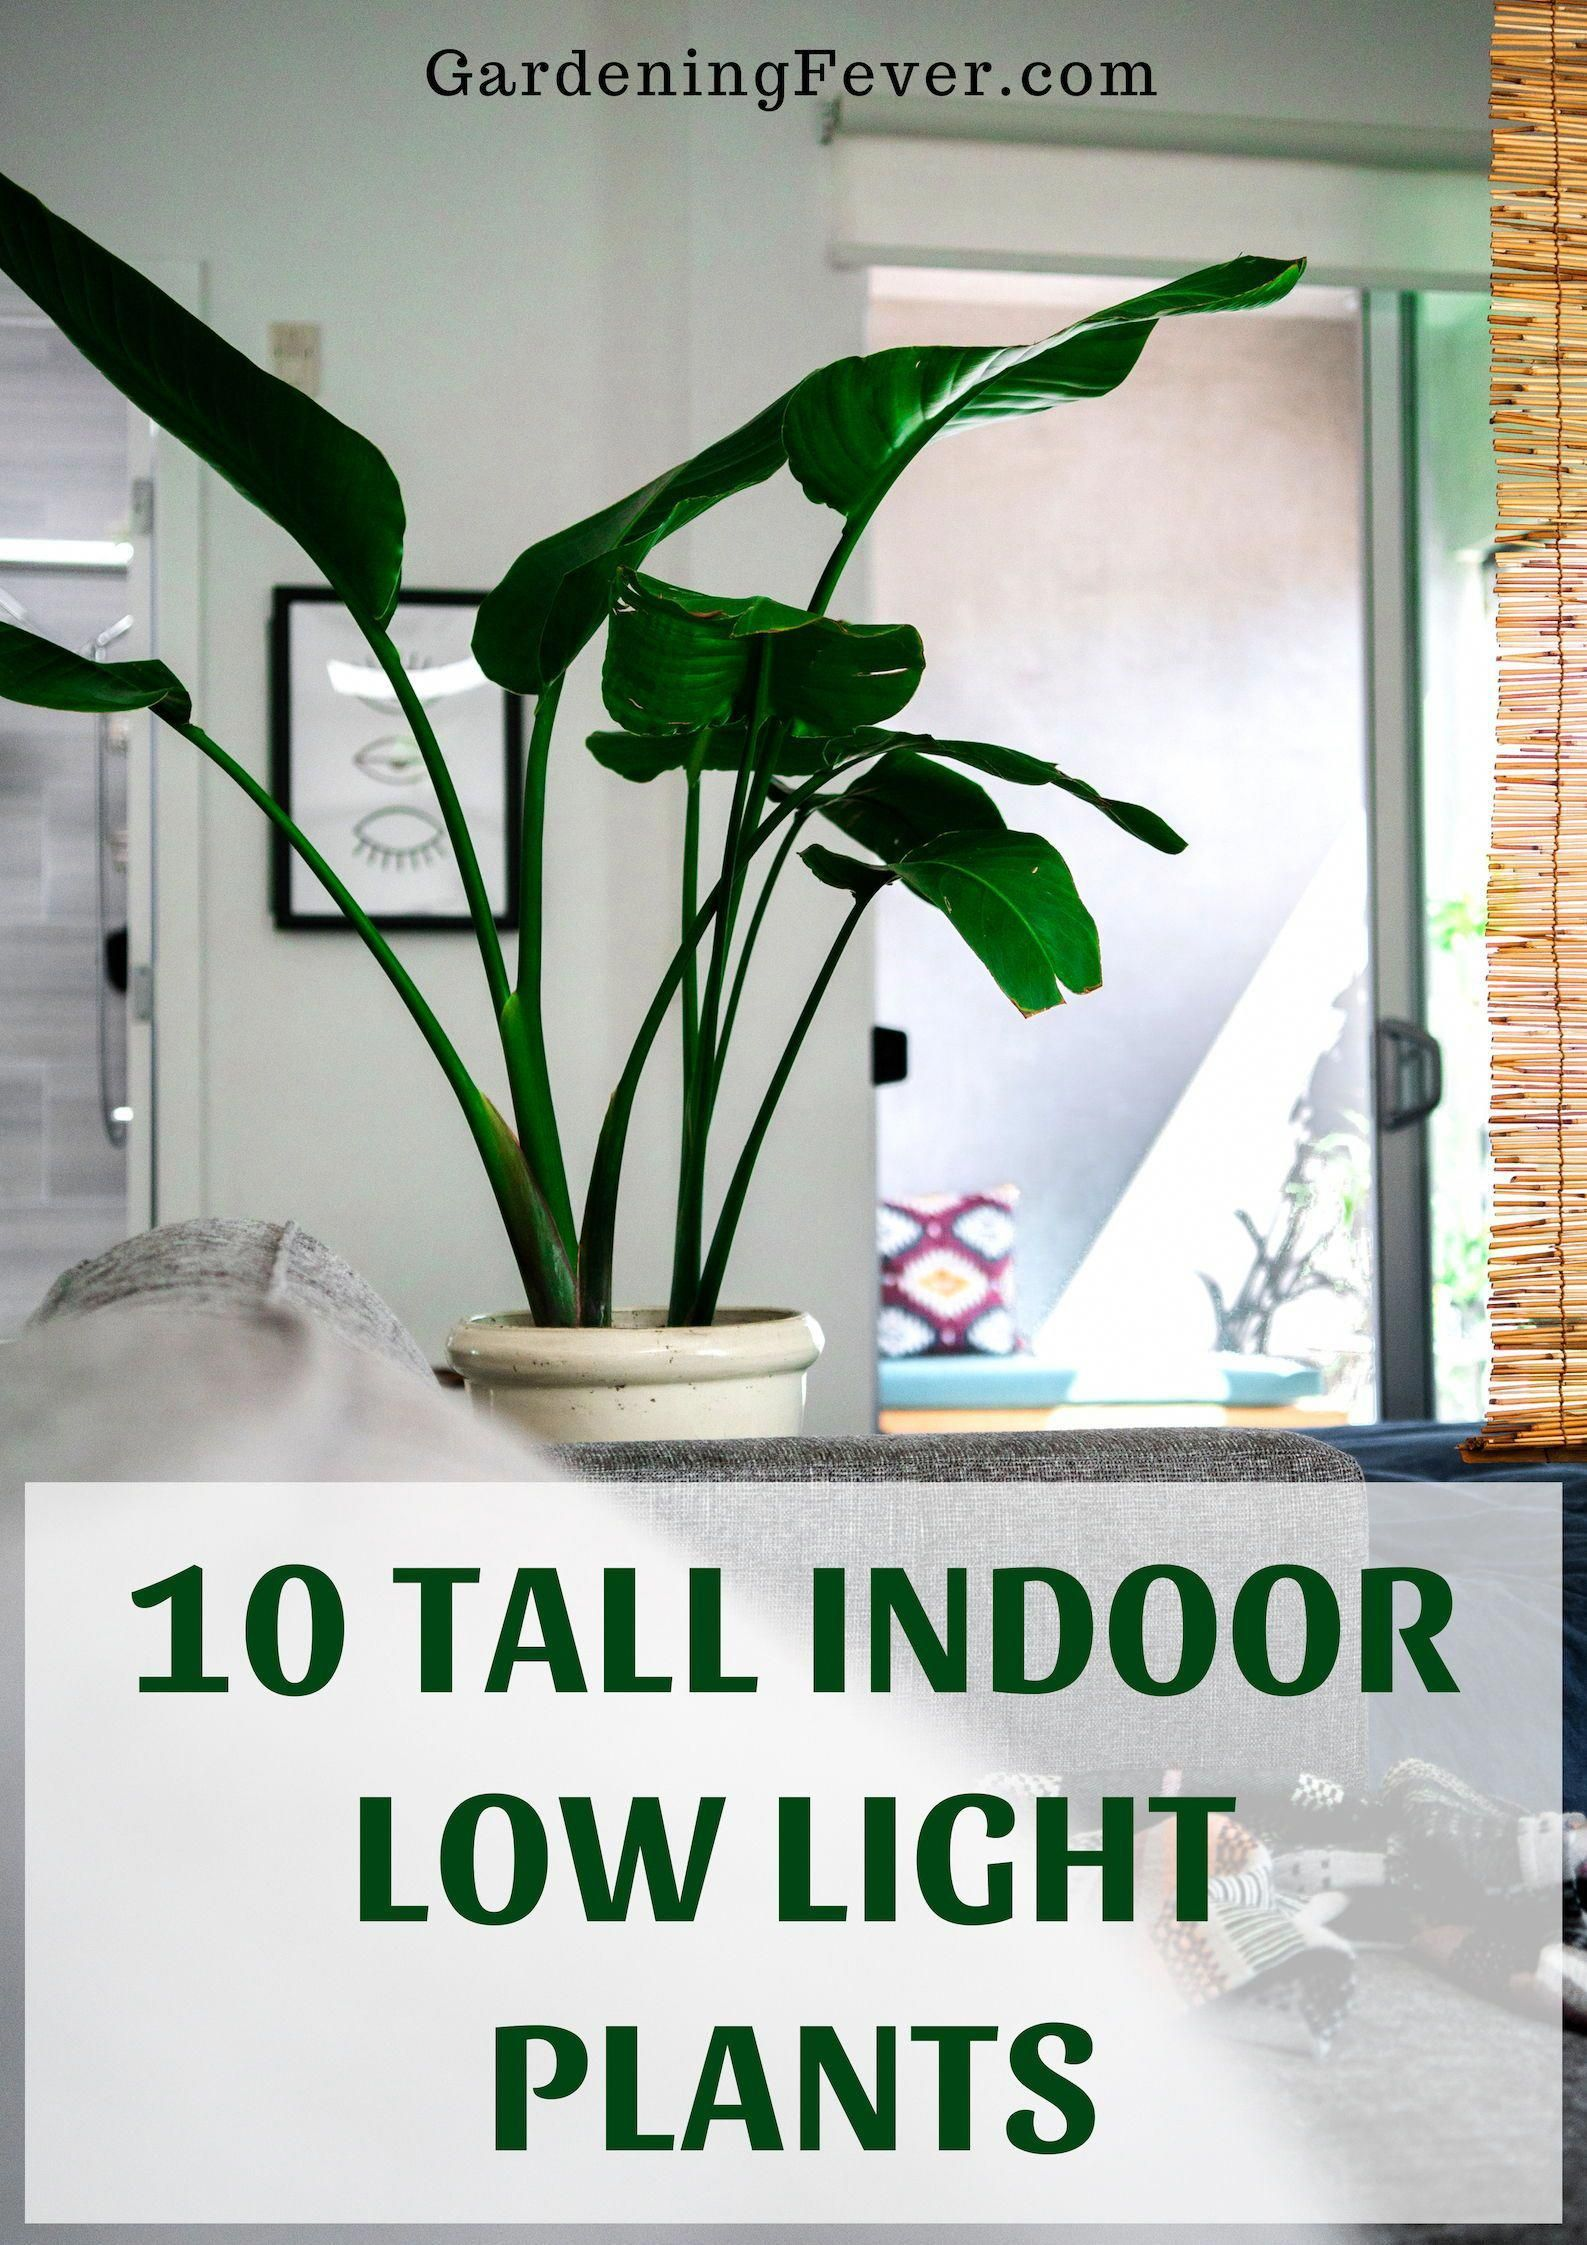 10 Tall Indoor Low Light Plants Gardening Fever In 2020 Large Indoor Plants Low Light House Plants Indoor Plants Low Light